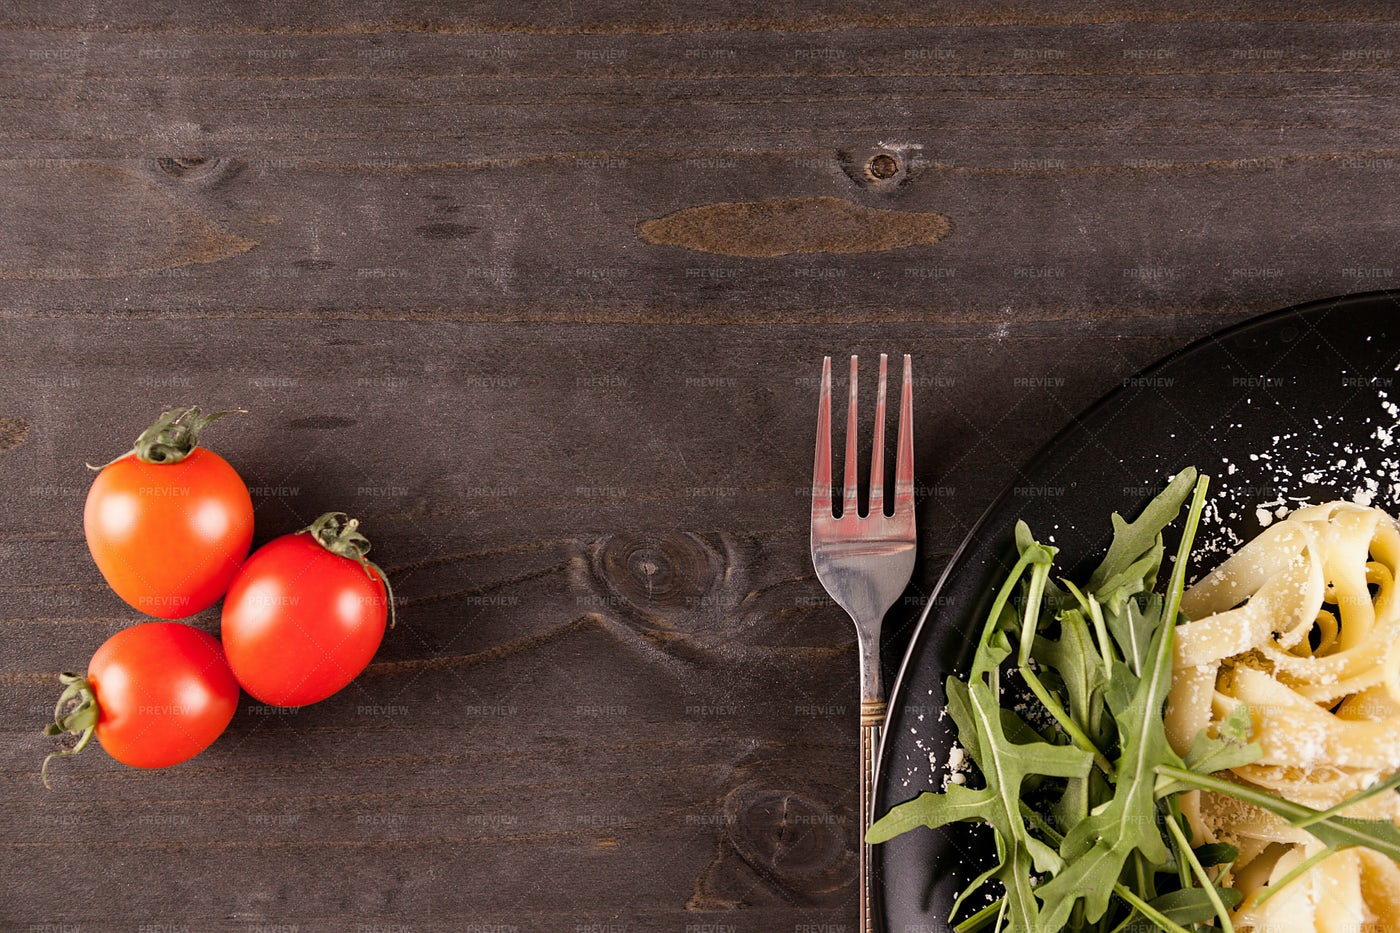 Tomatoes Near Pasta Dish: Stock Photos